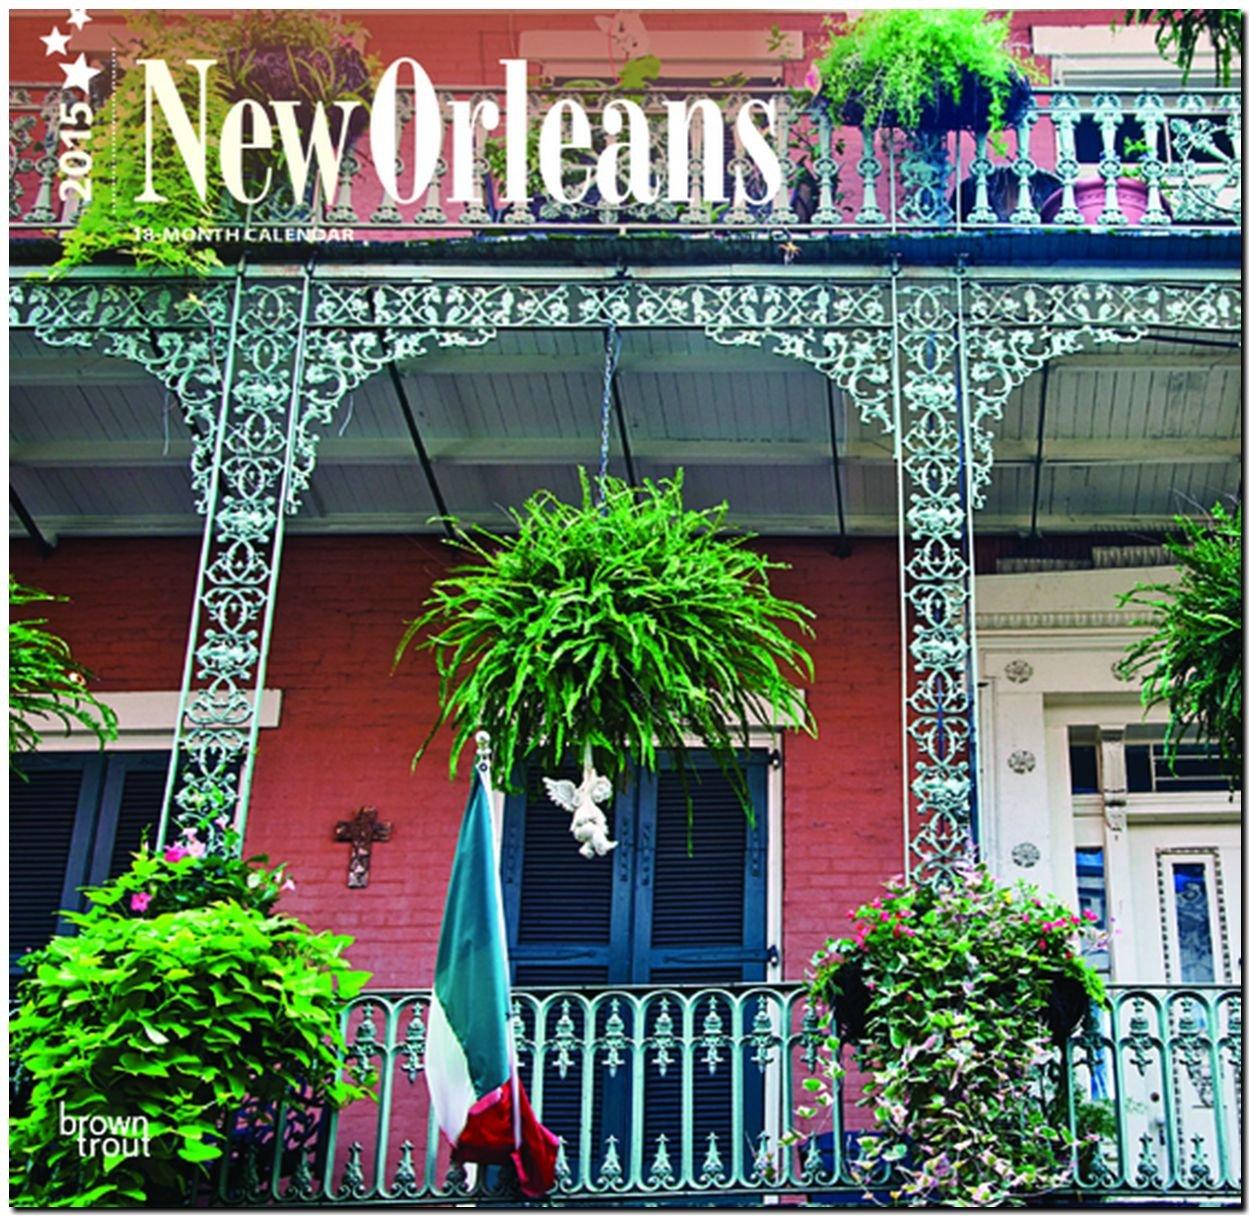 New Orleans 2015: Original BrownTrout-Kalender [Mehrsprachig] [Kalender] (Englisch) Kalender – Wandkalender, 30. September 2014 Browntrout Publishers Brown Trout 146502462X Calendar